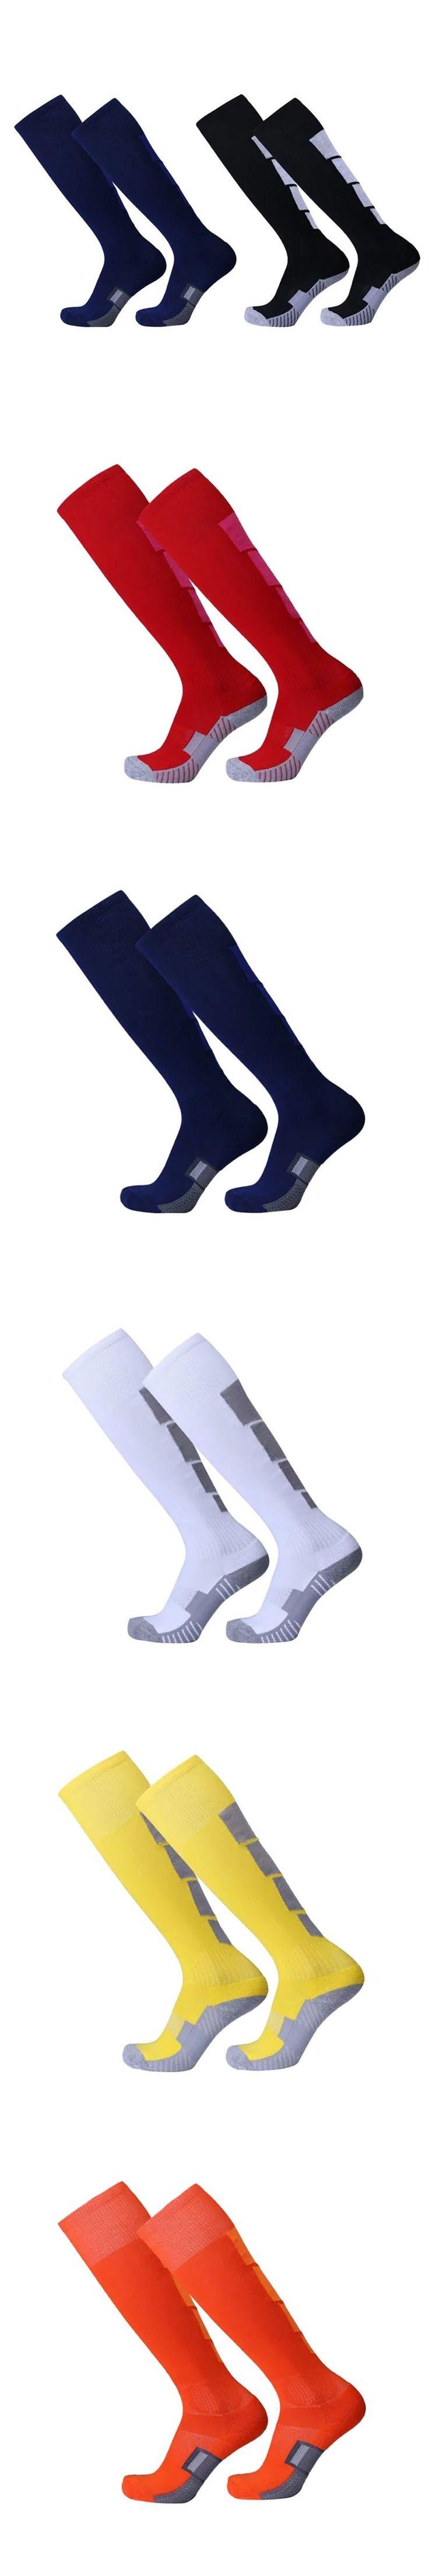 2017 Men Boys Cotton Comfortable Leg Compression Long Socks Stretch Relief Soft Socks Plain Over Knee High Sock